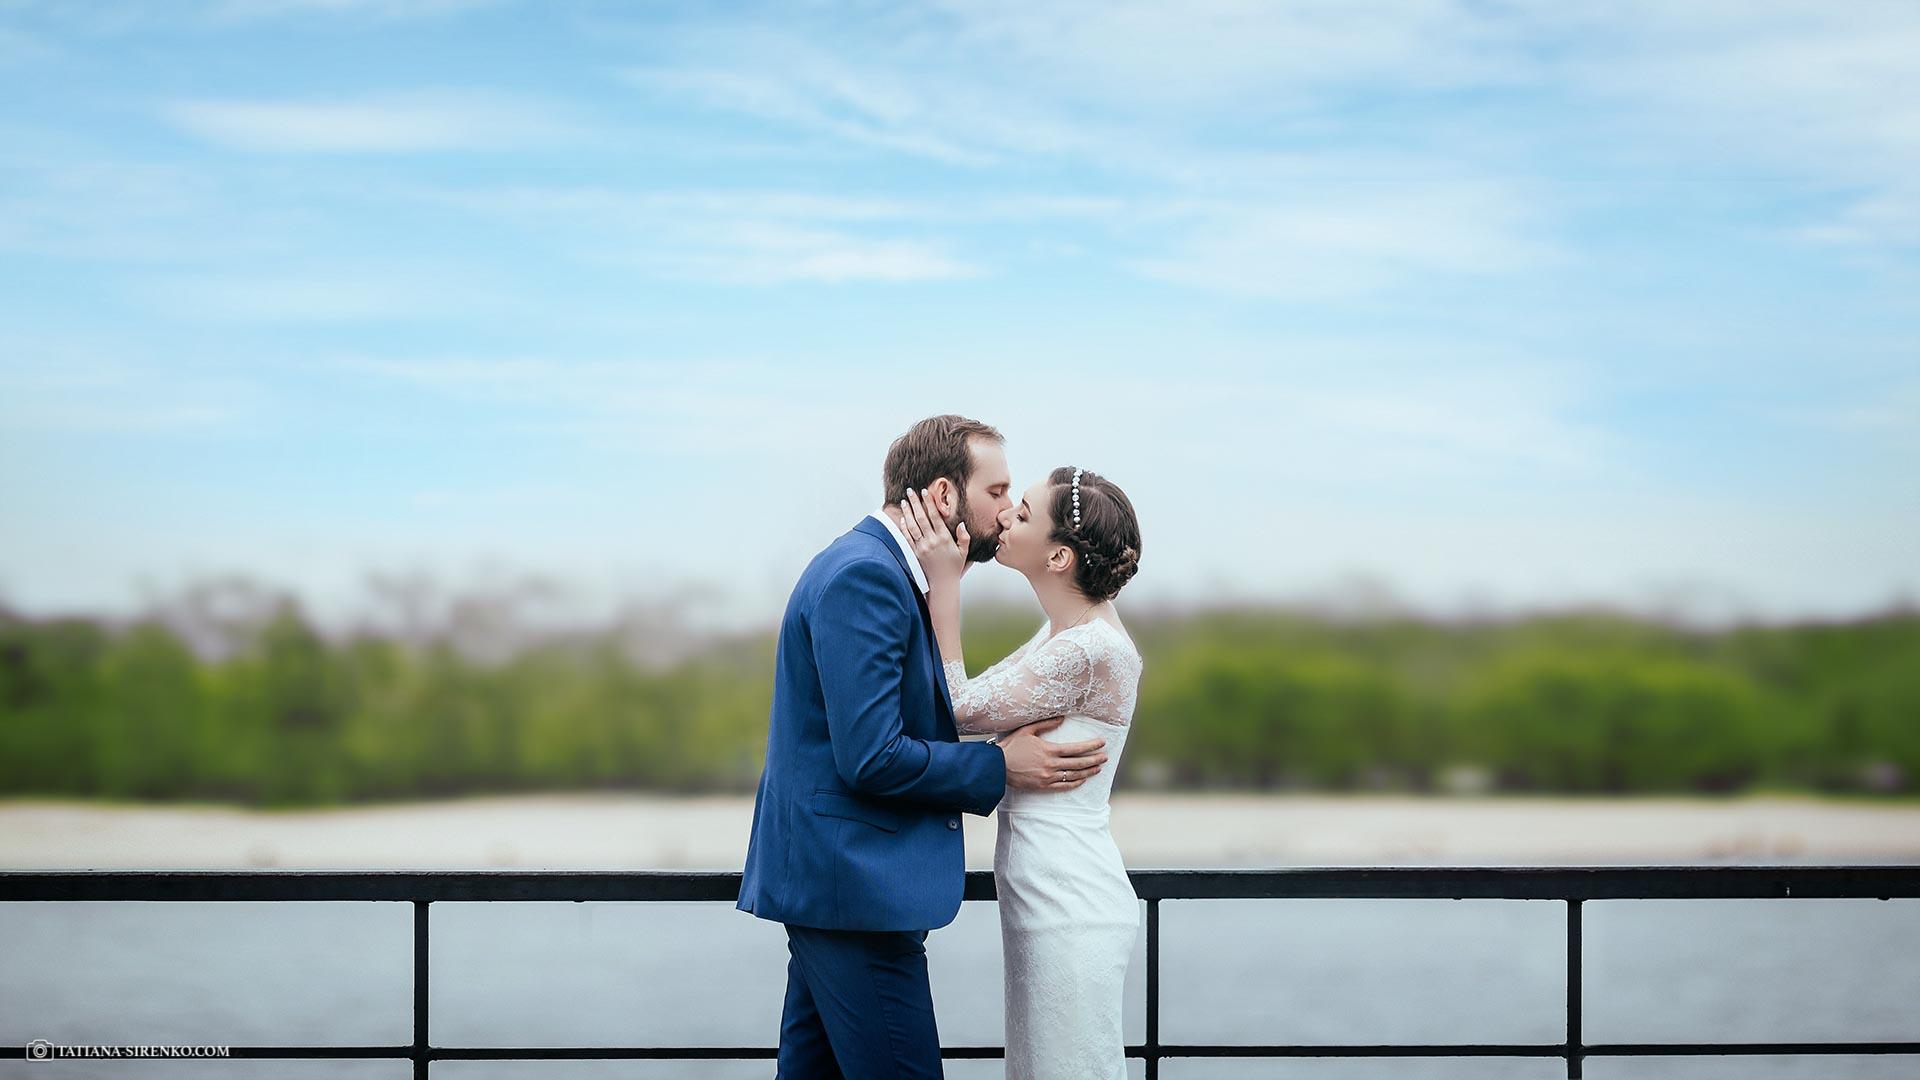 Фотосъемка свадьбы Набережная